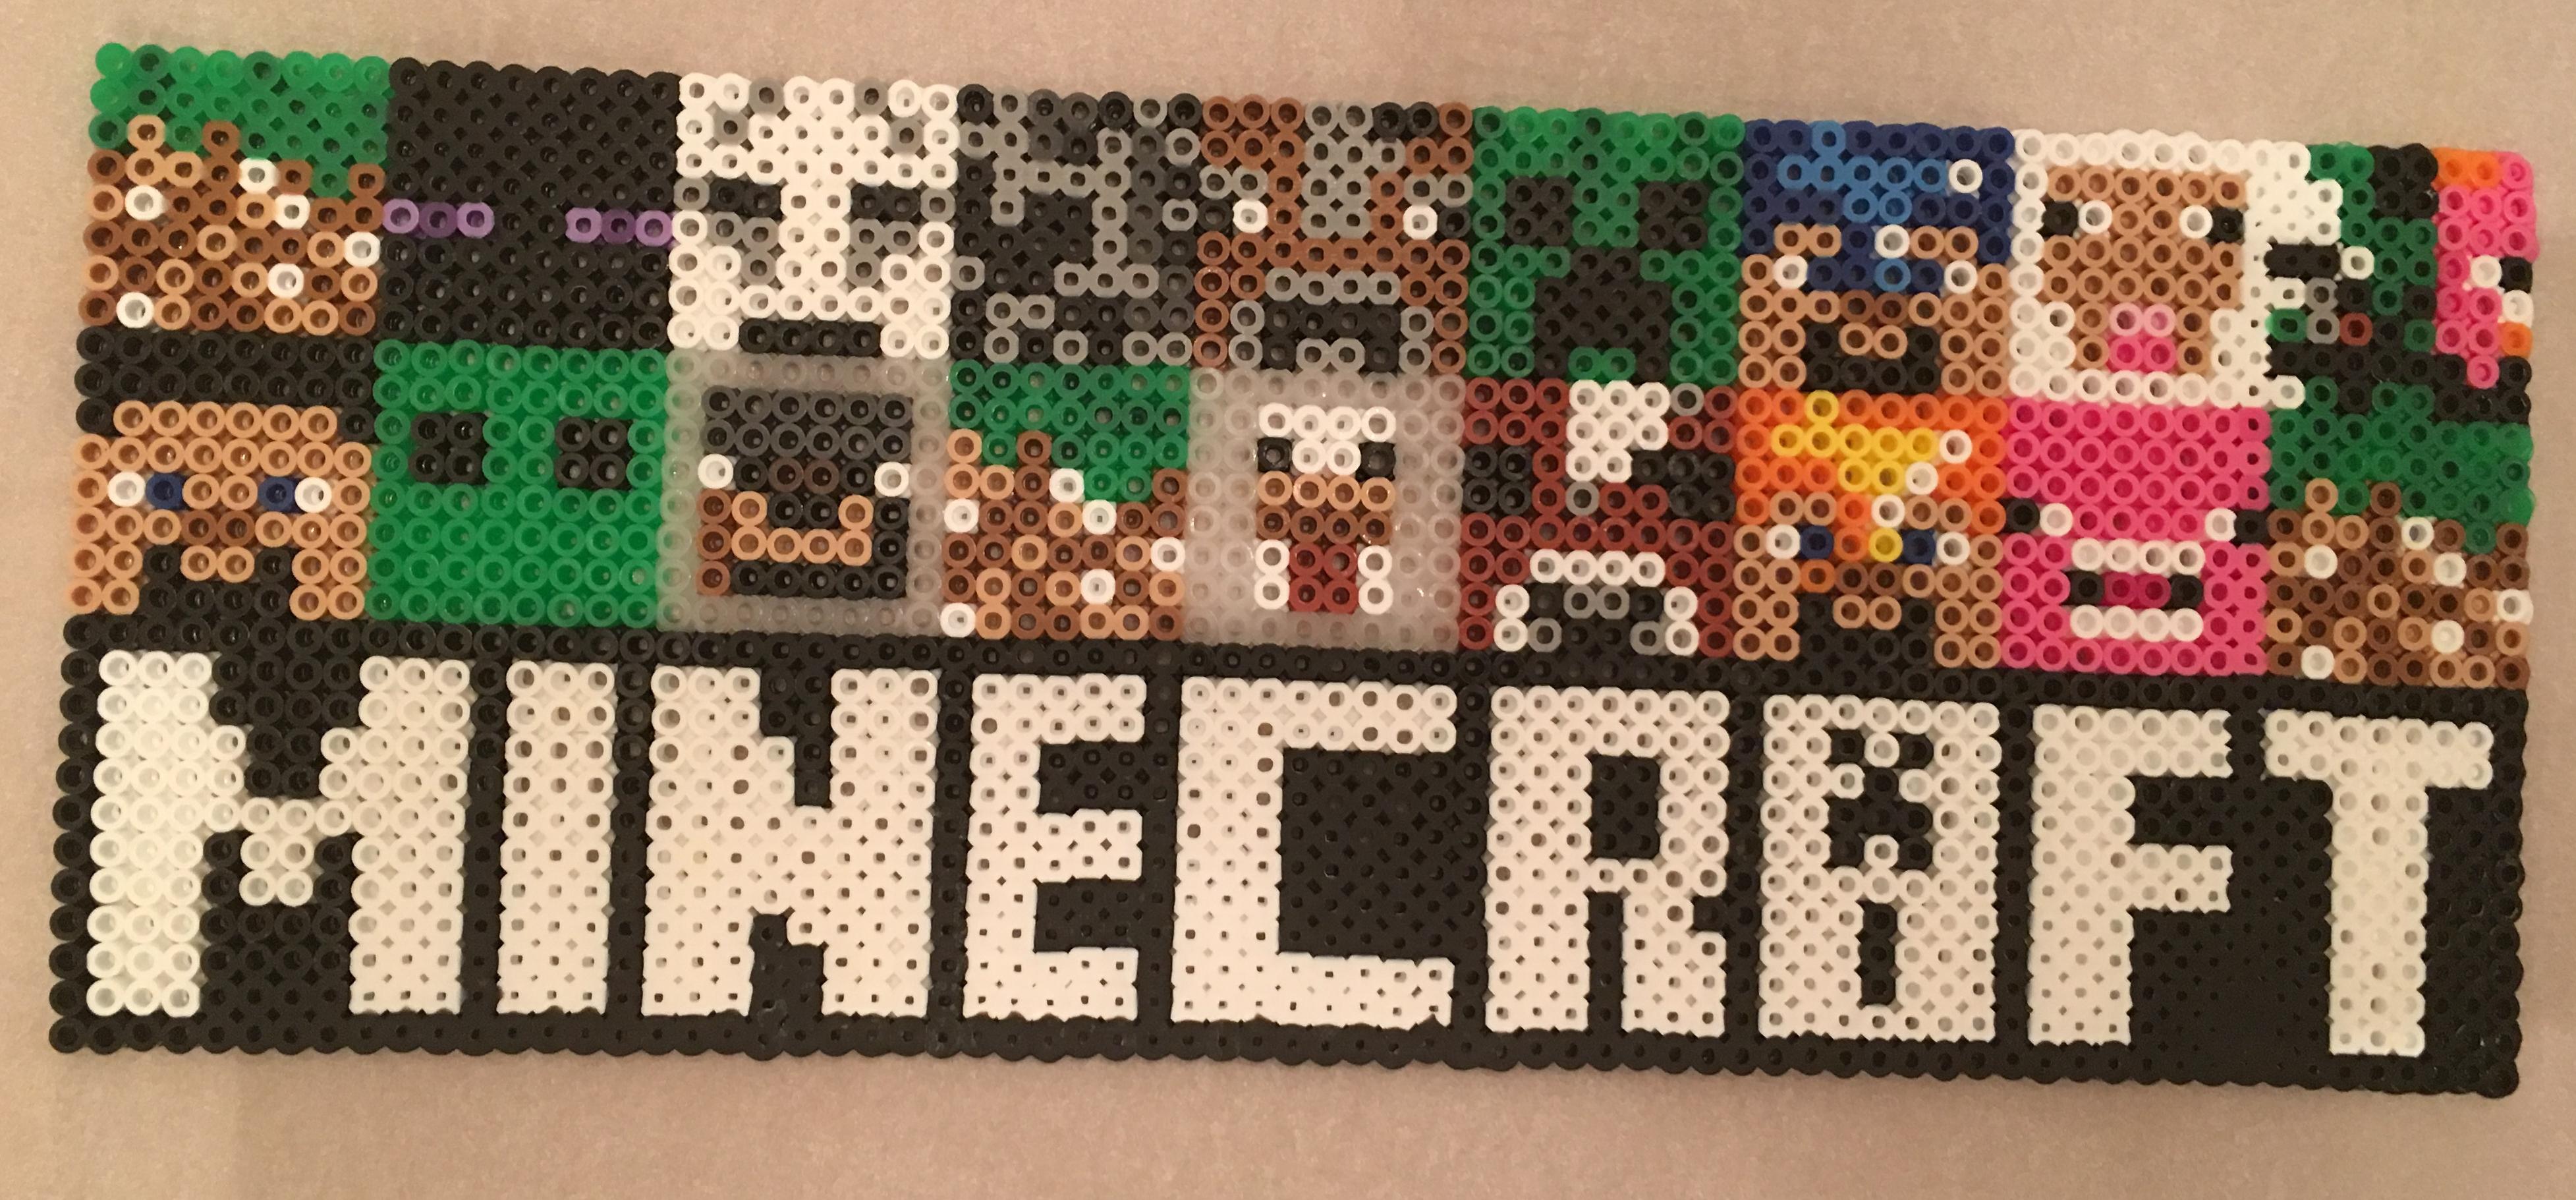 Minecraft Perler Bead Design Melted